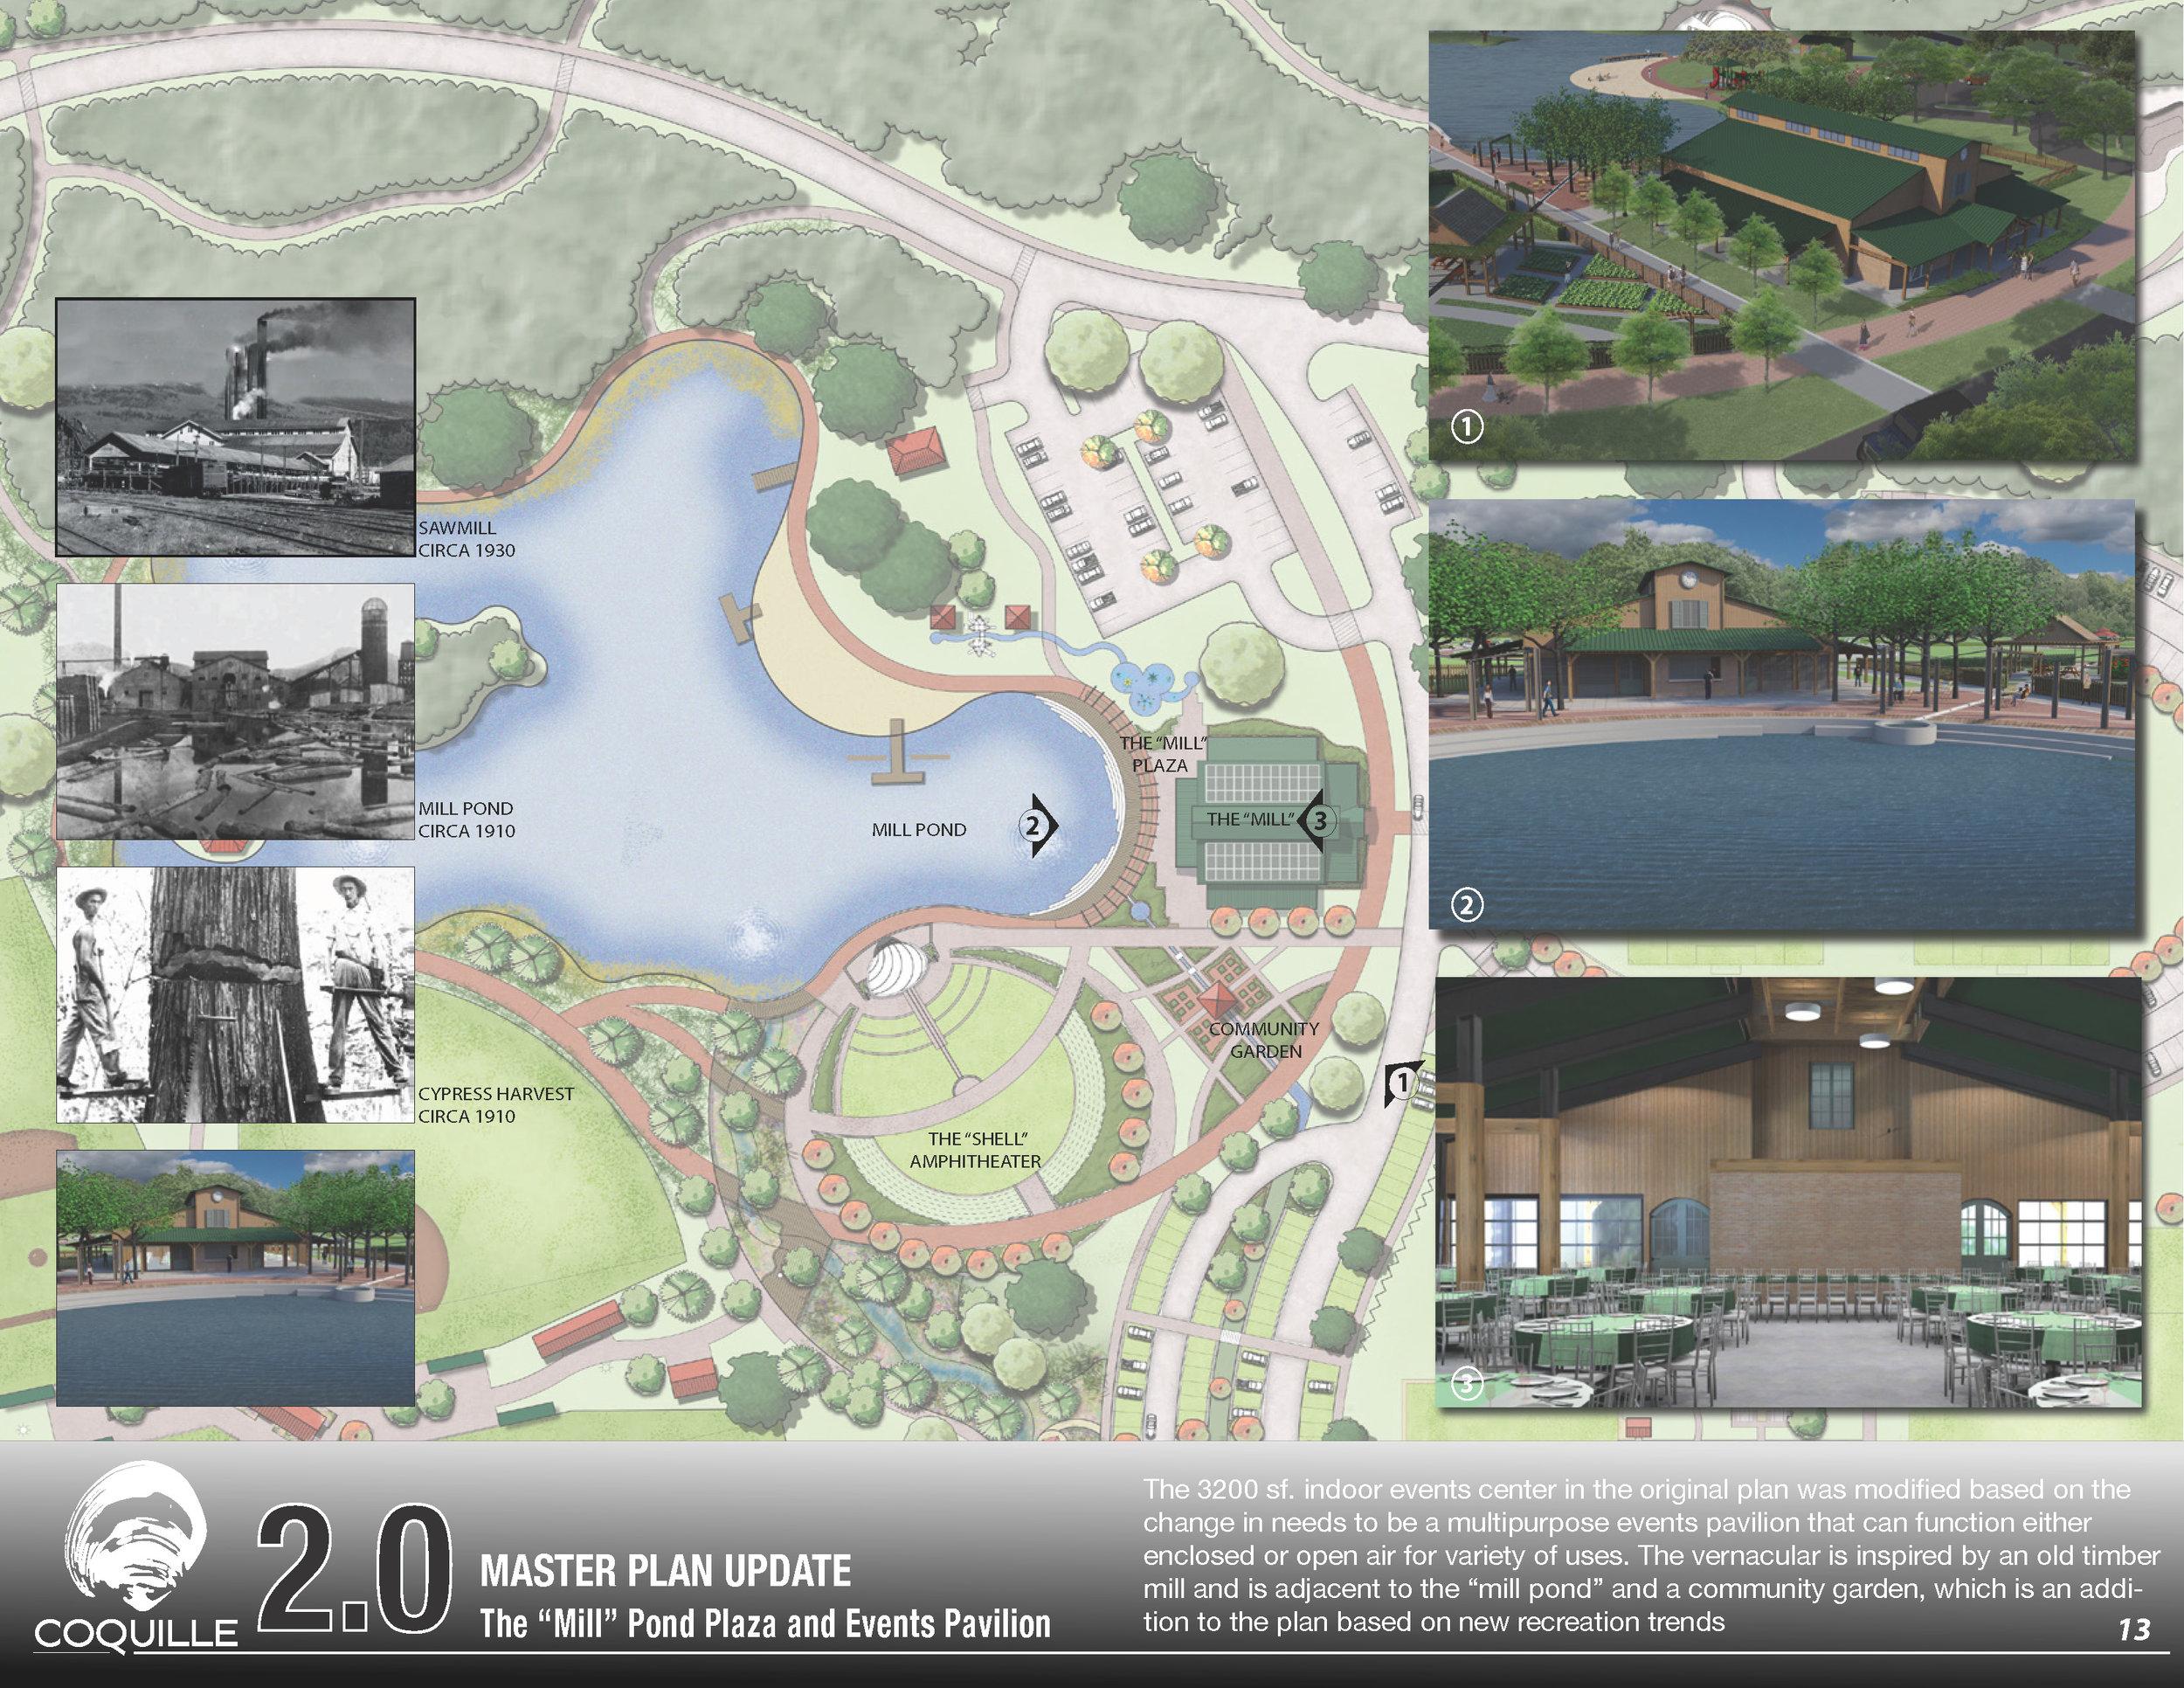 Joseph Furr Design Studio - Coquille Master Plan_Page_11.jpg